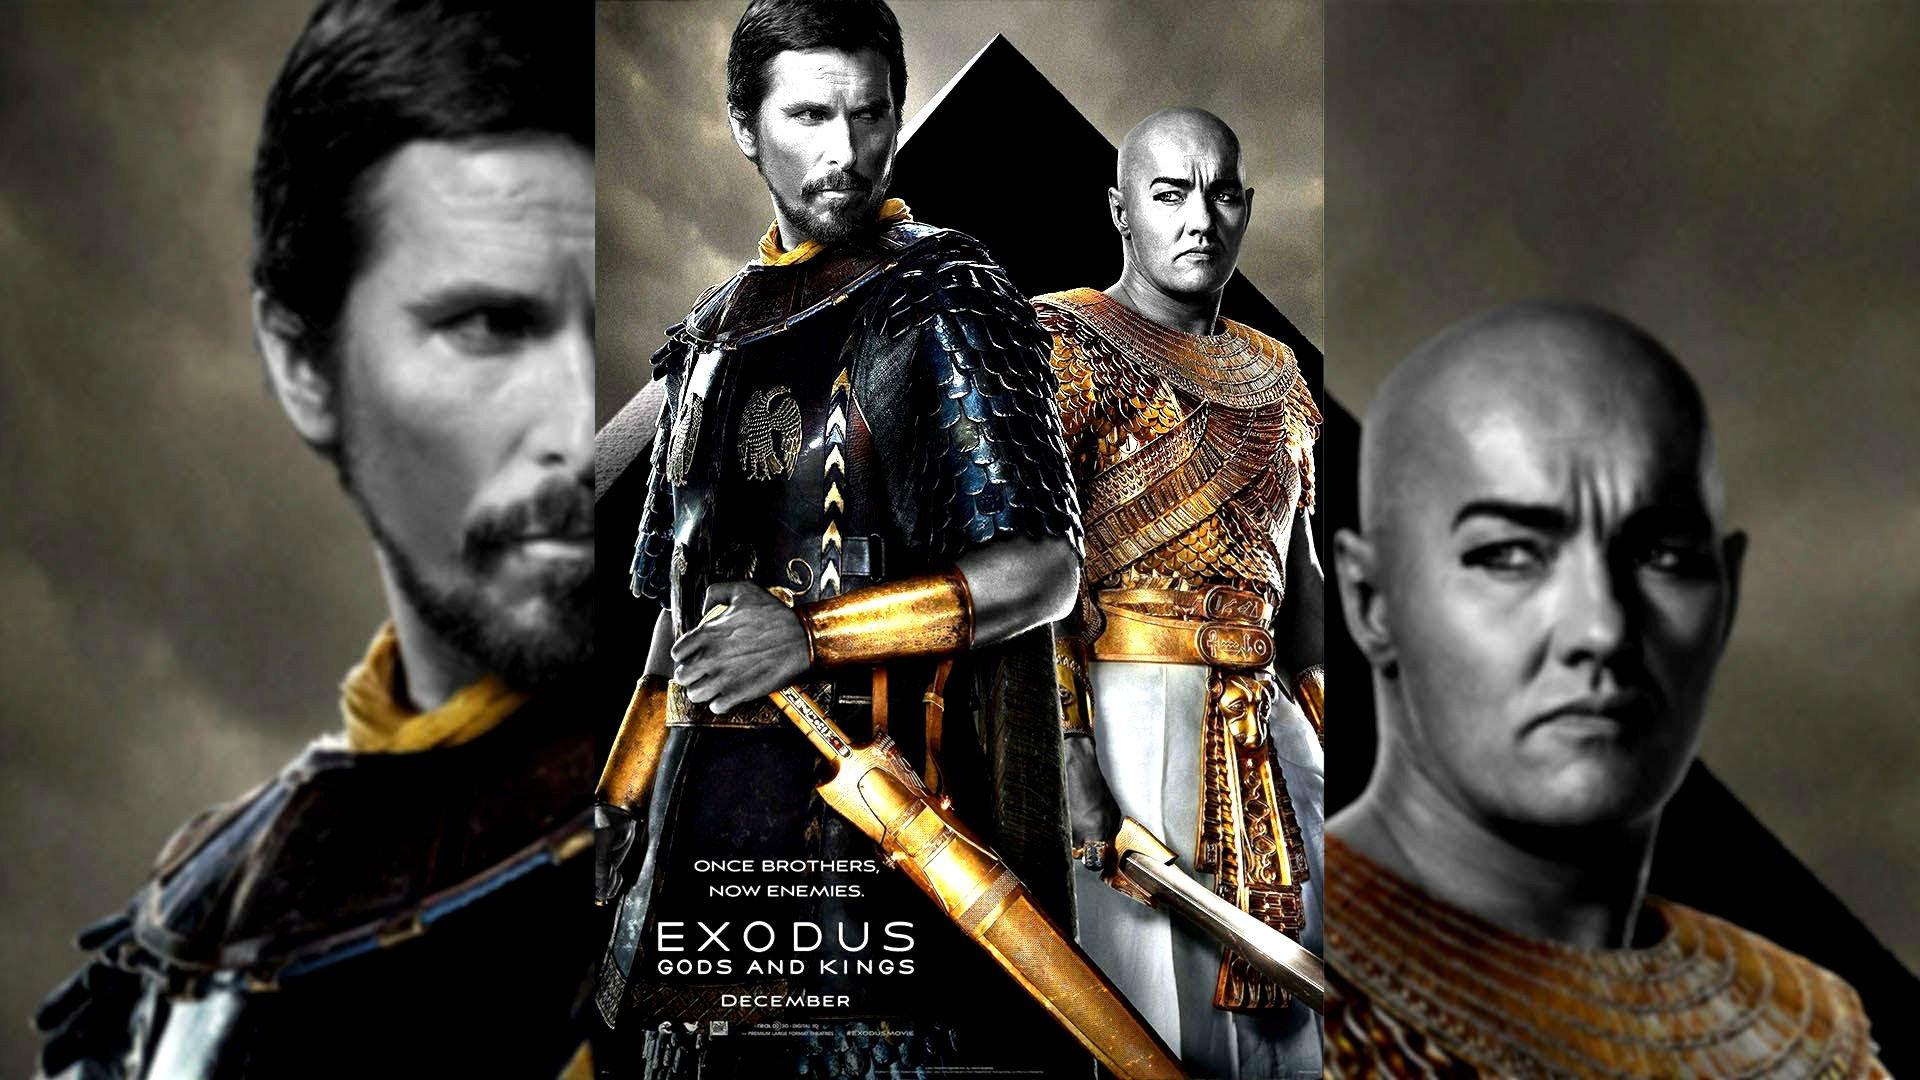 Exodus Gods And Kings Religion Christian Drama Bale Wallpaper 1920x1080 477264 Wallpaperup